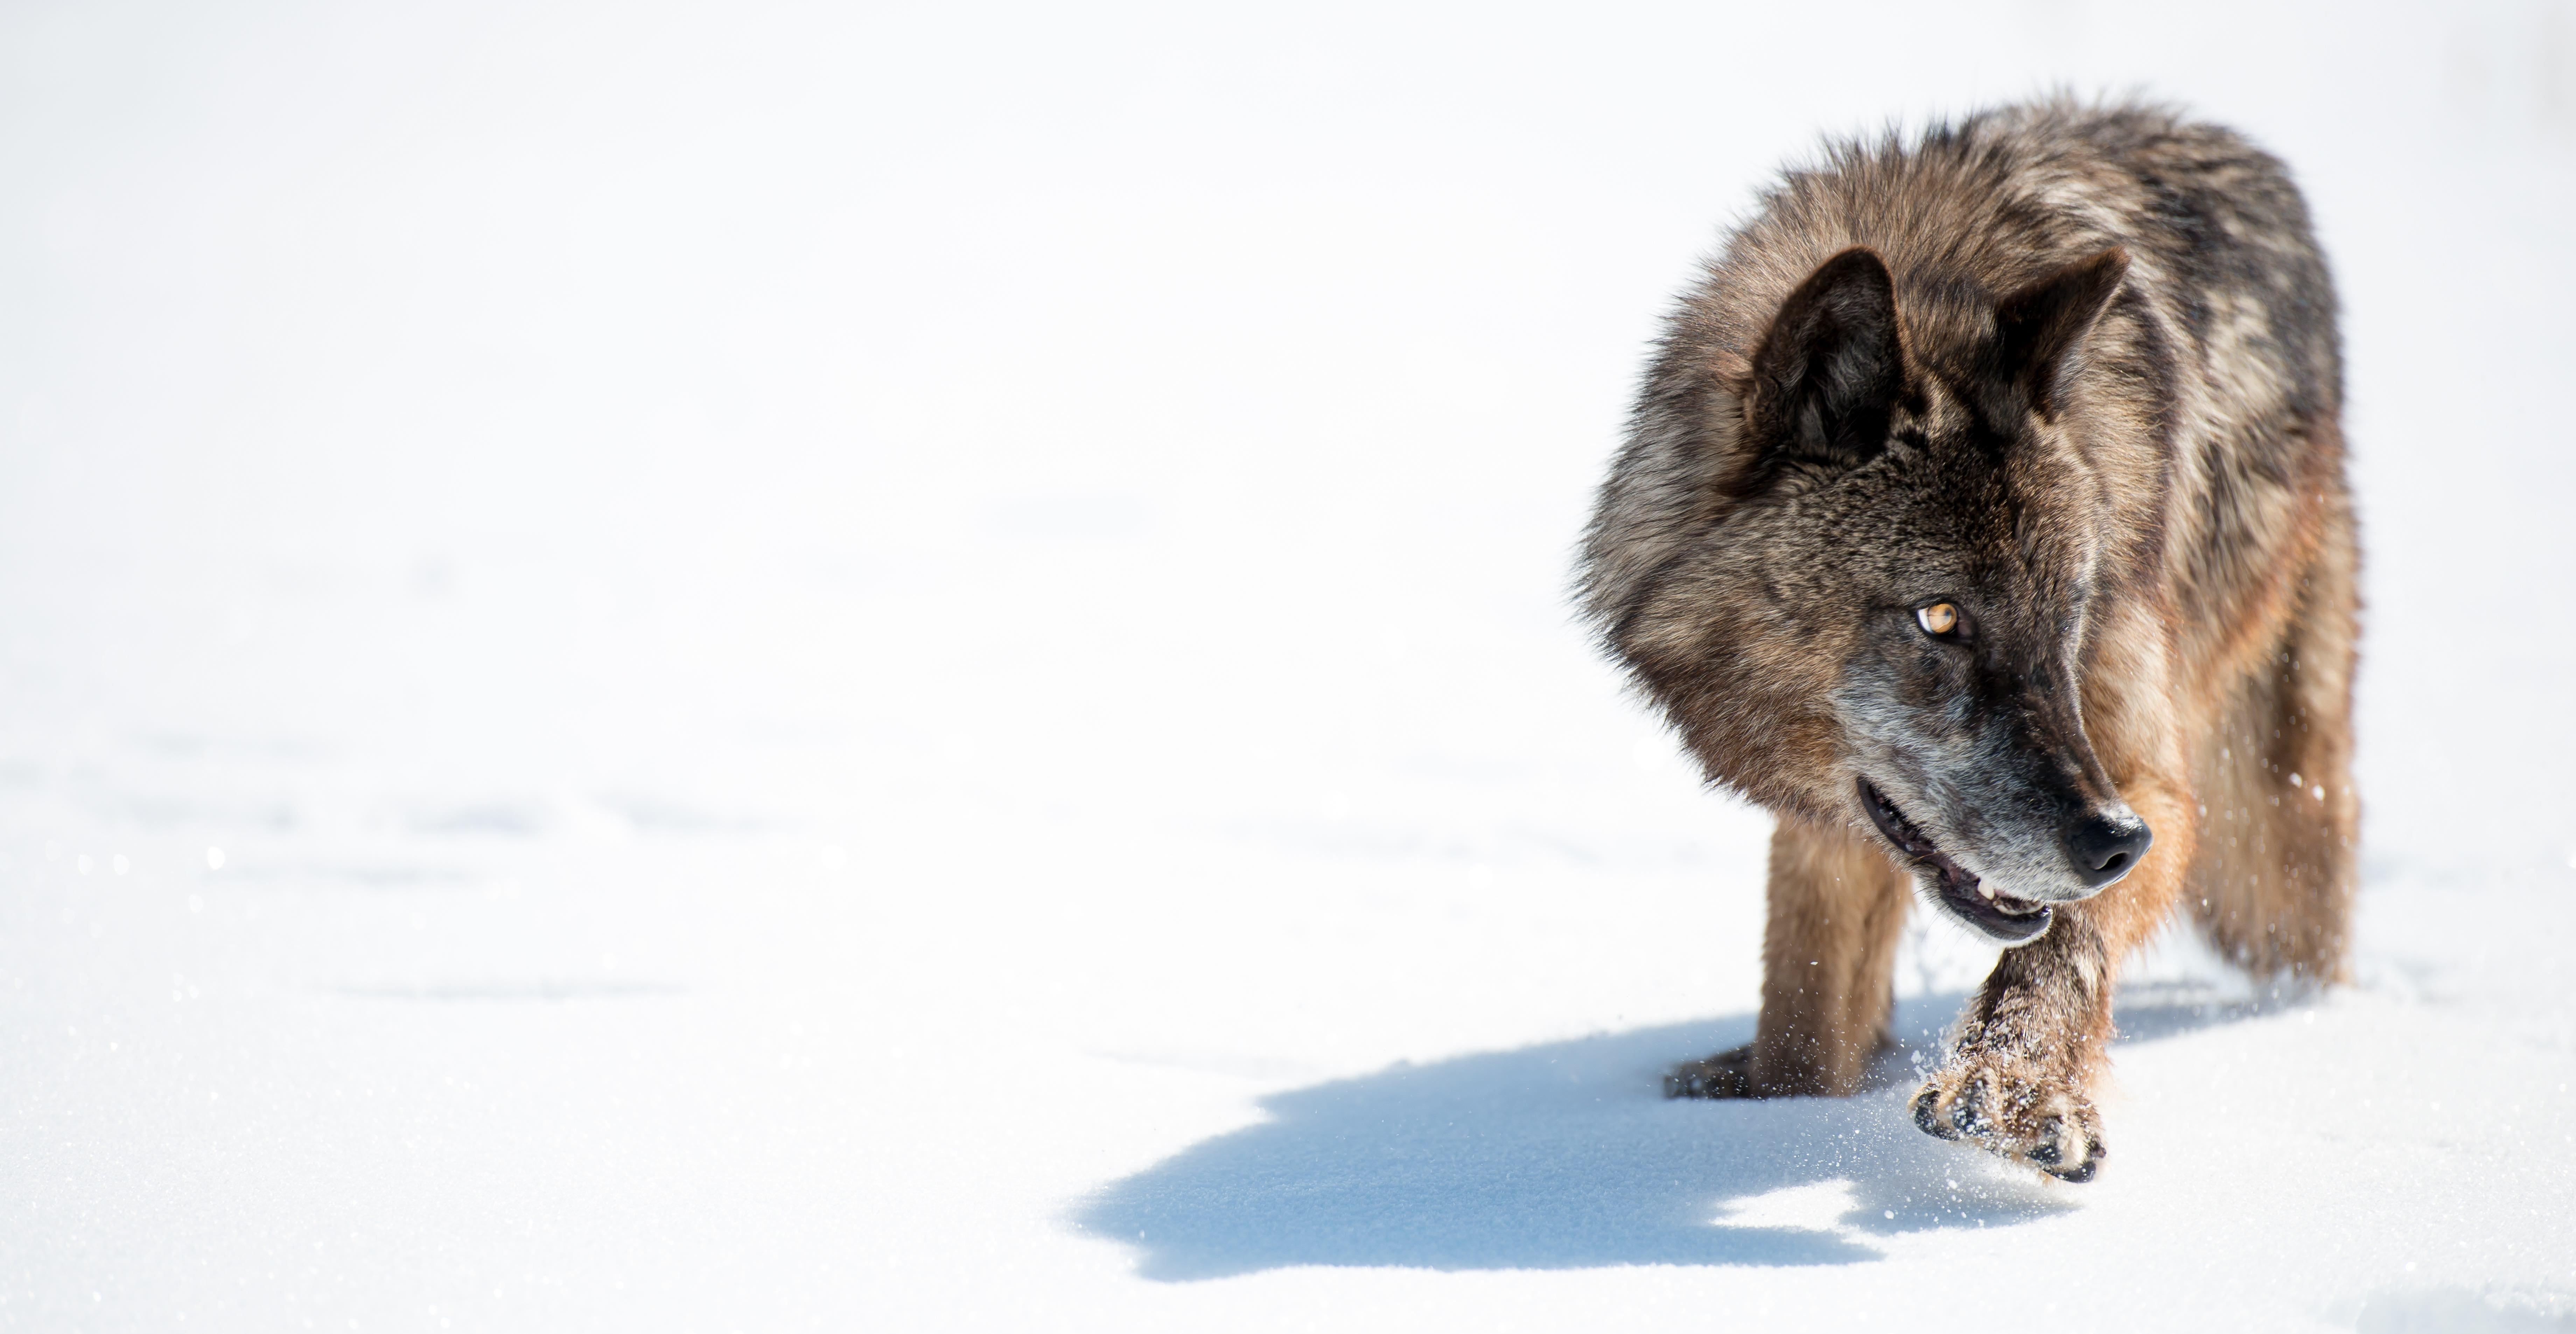 A captive wolf stalking through snow at Wildbrunch Ranch in Idaho.